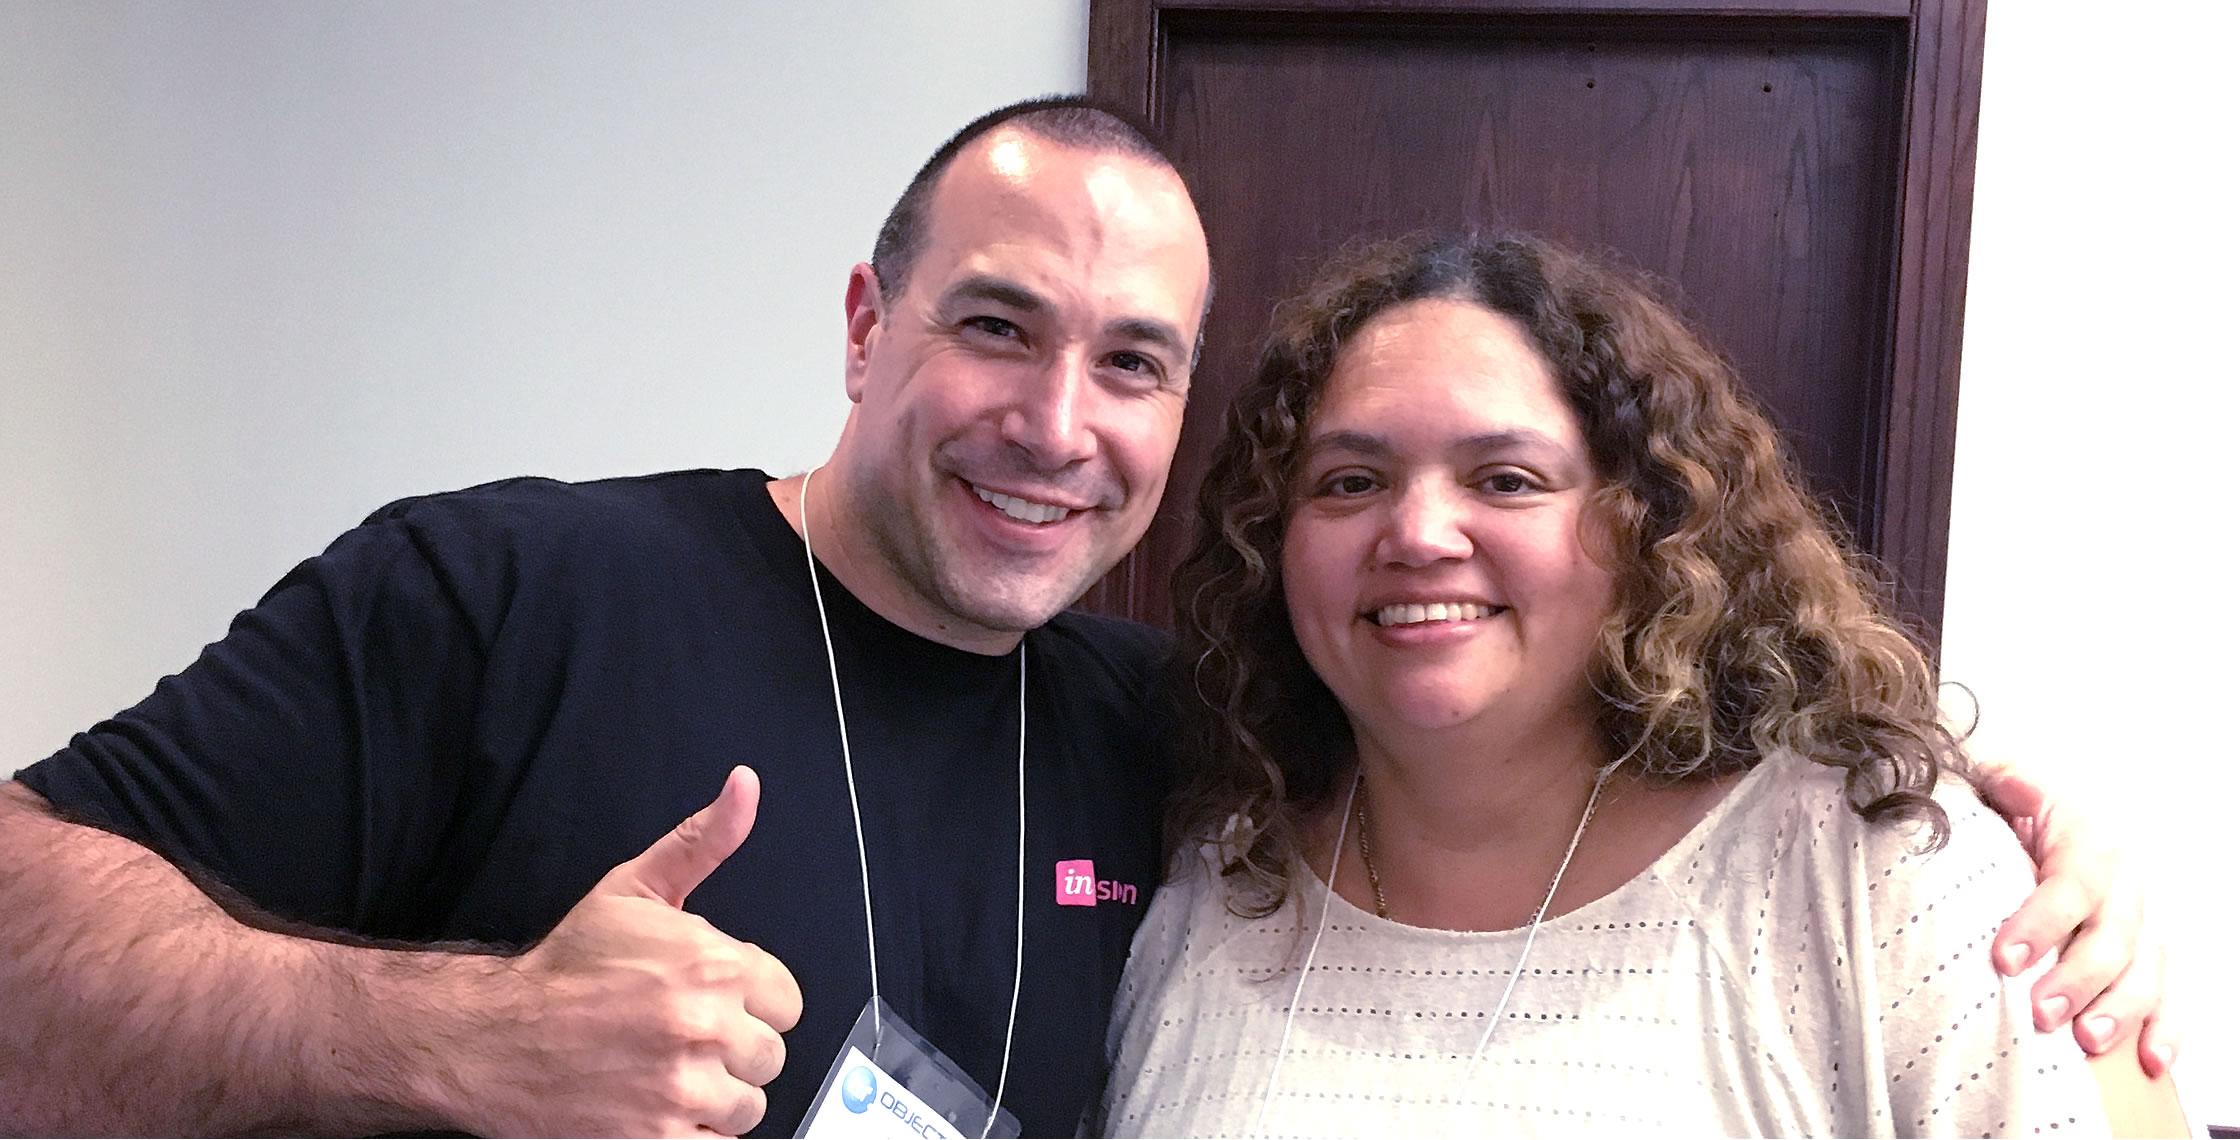 Ben Nadel at cf.Objective() 2017 (Washington, D.C.) with: Susan Brun